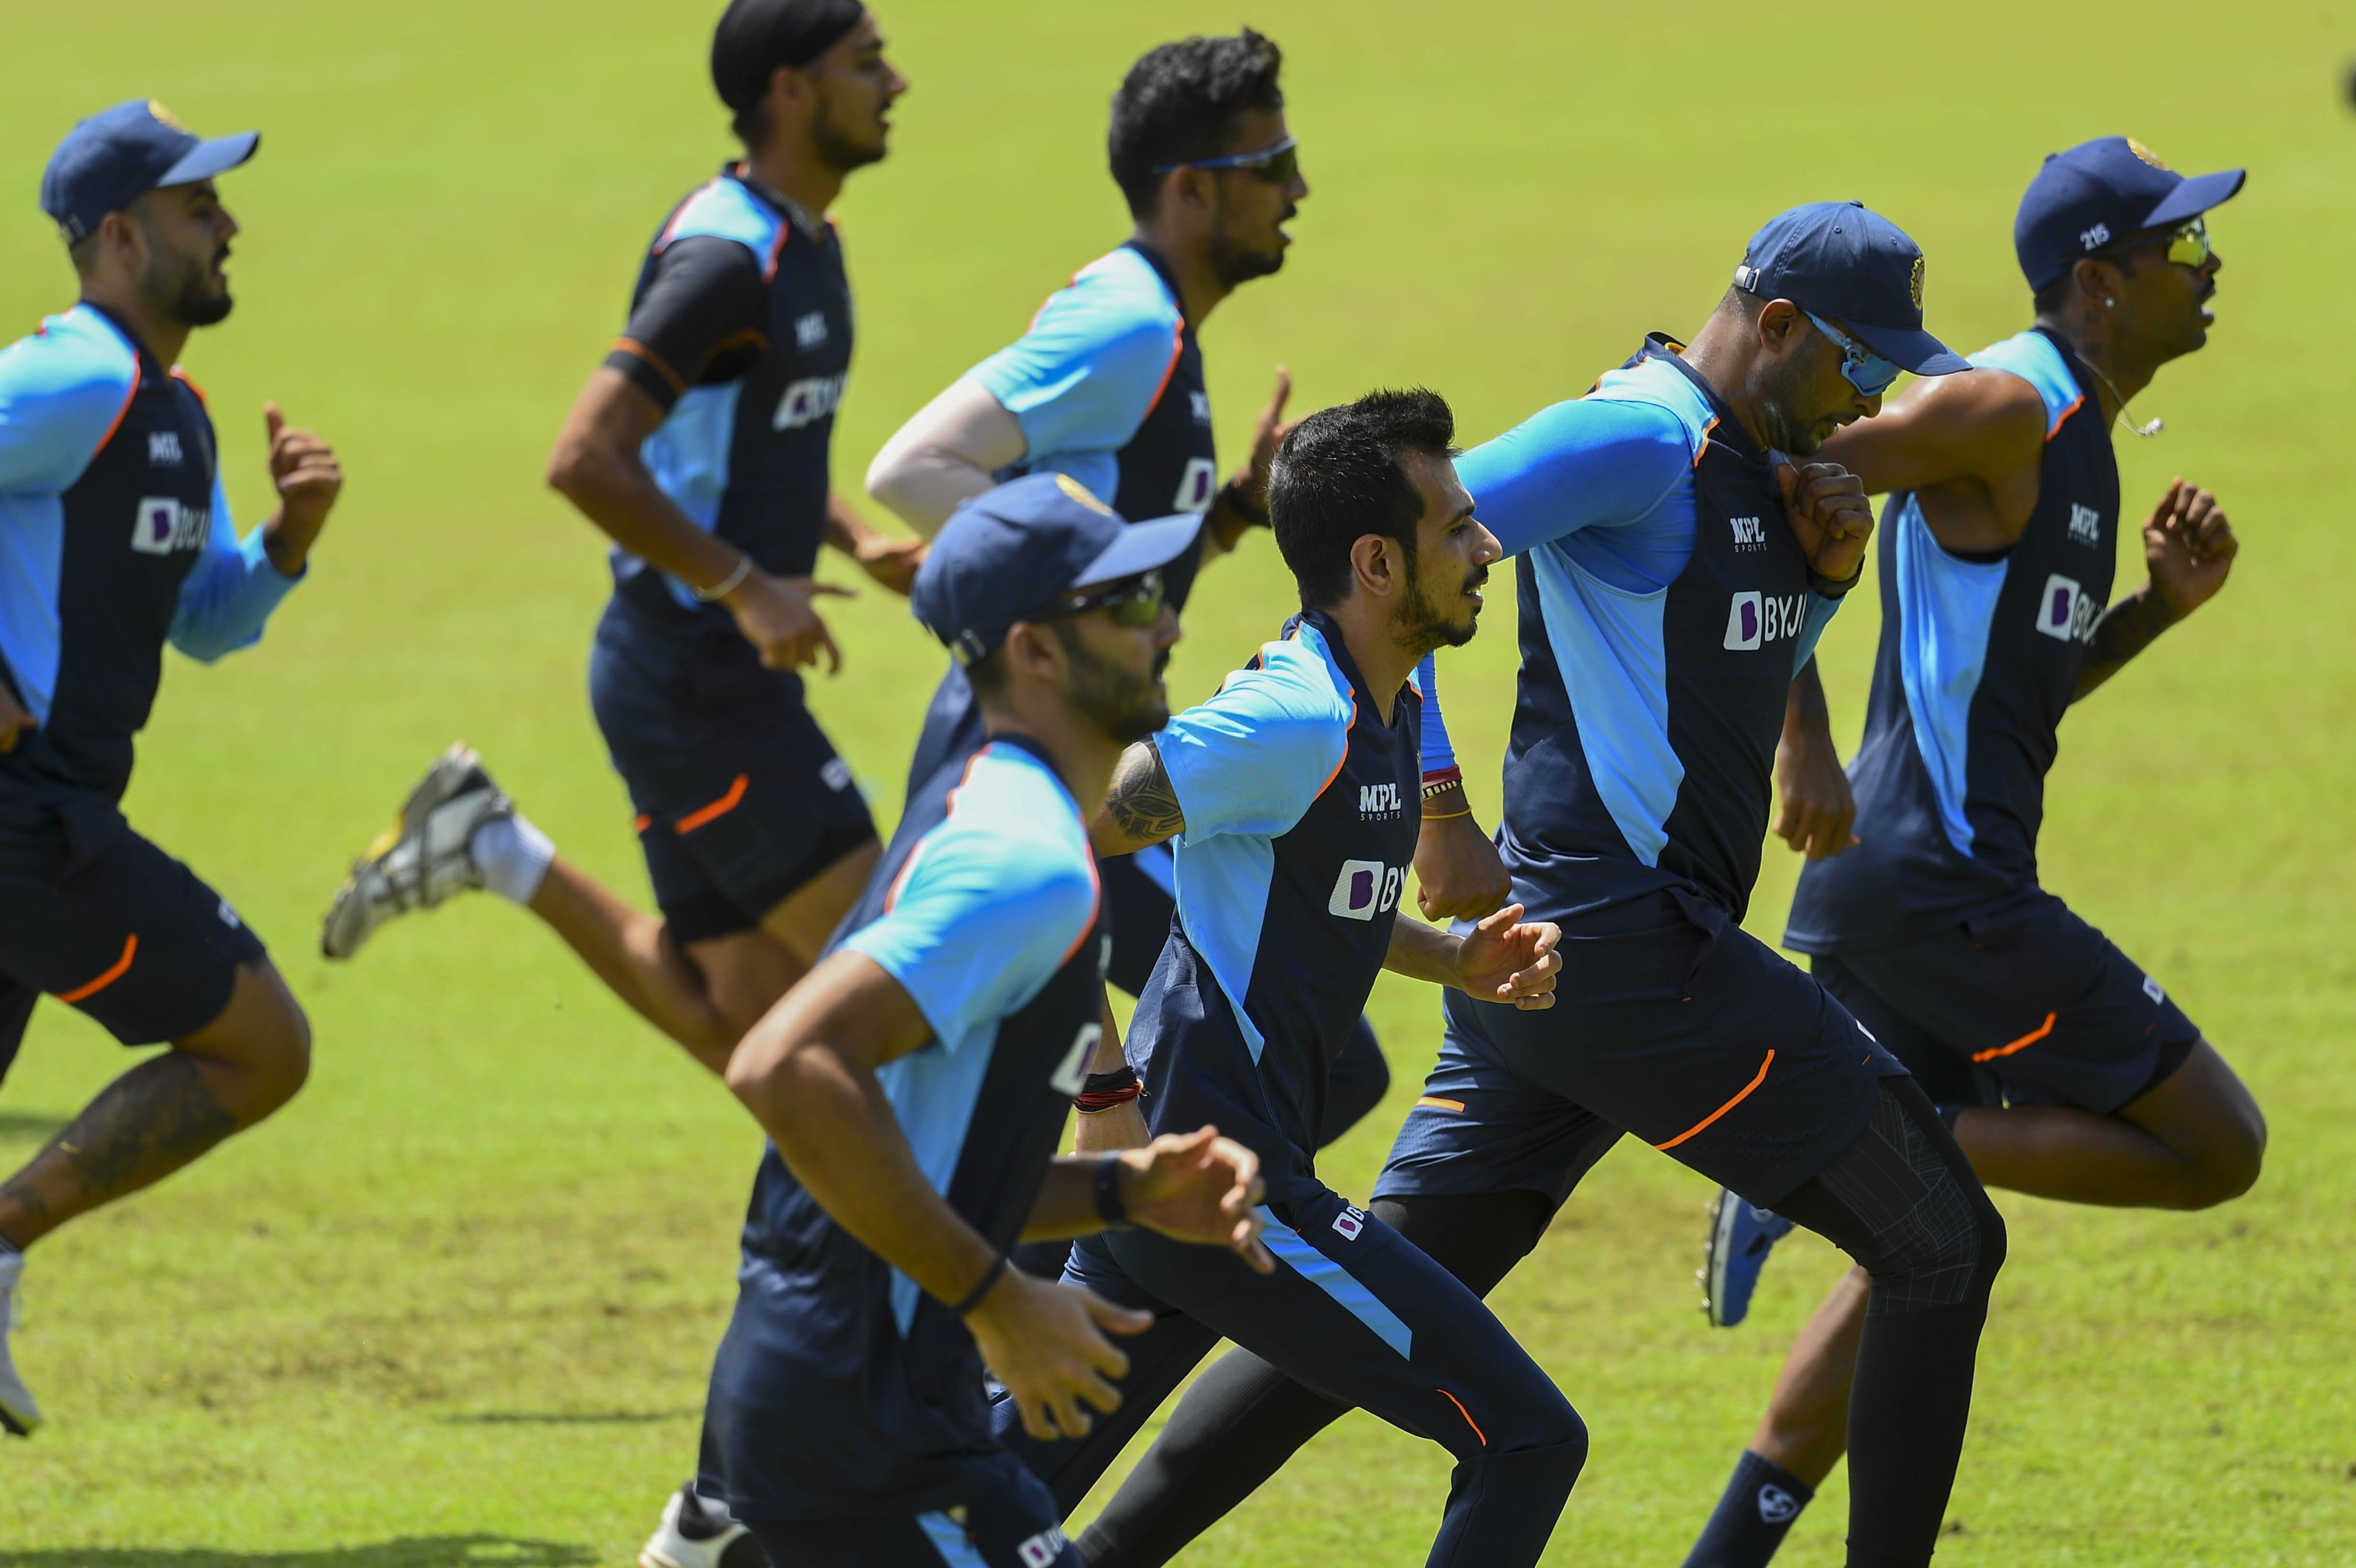 SL vs IND: શ્રીલંકા વિરુદ્ધ પ્રથમ વનડે માટે આવી હોઈ શકે છે ભારતની પ્લેઇંગ  XI, સંજૂ સેમસન કરી શકે છે પર્દાપણ